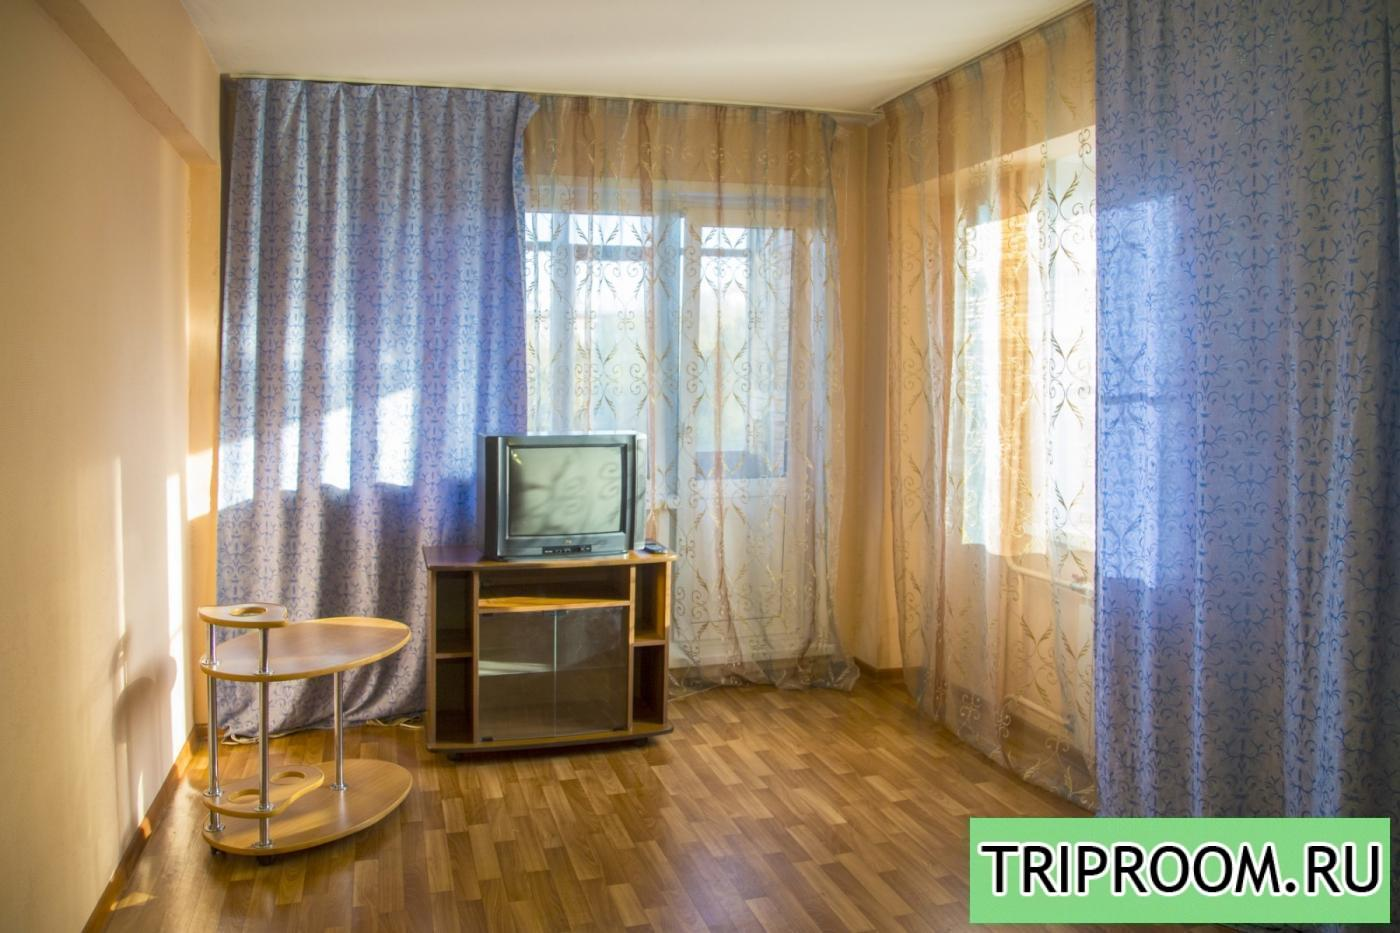 1-комнатная квартира посуточно (вариант № 6615), ул. Александра Матросова улица, фото № 1